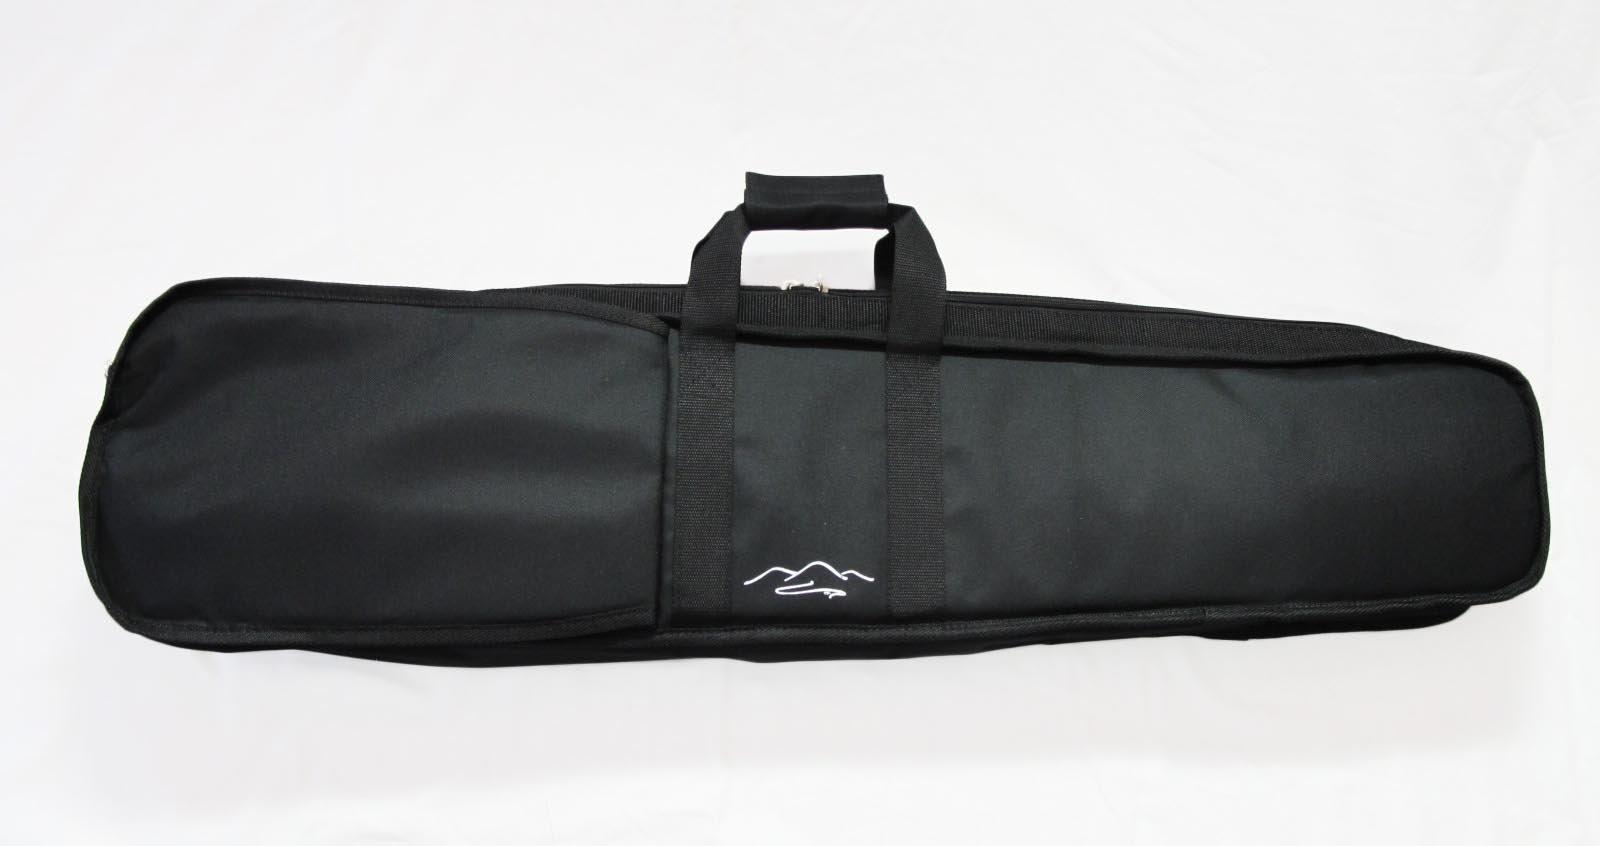 TK O'Brien's Mountain Dulcimer Carrying Case (Black)